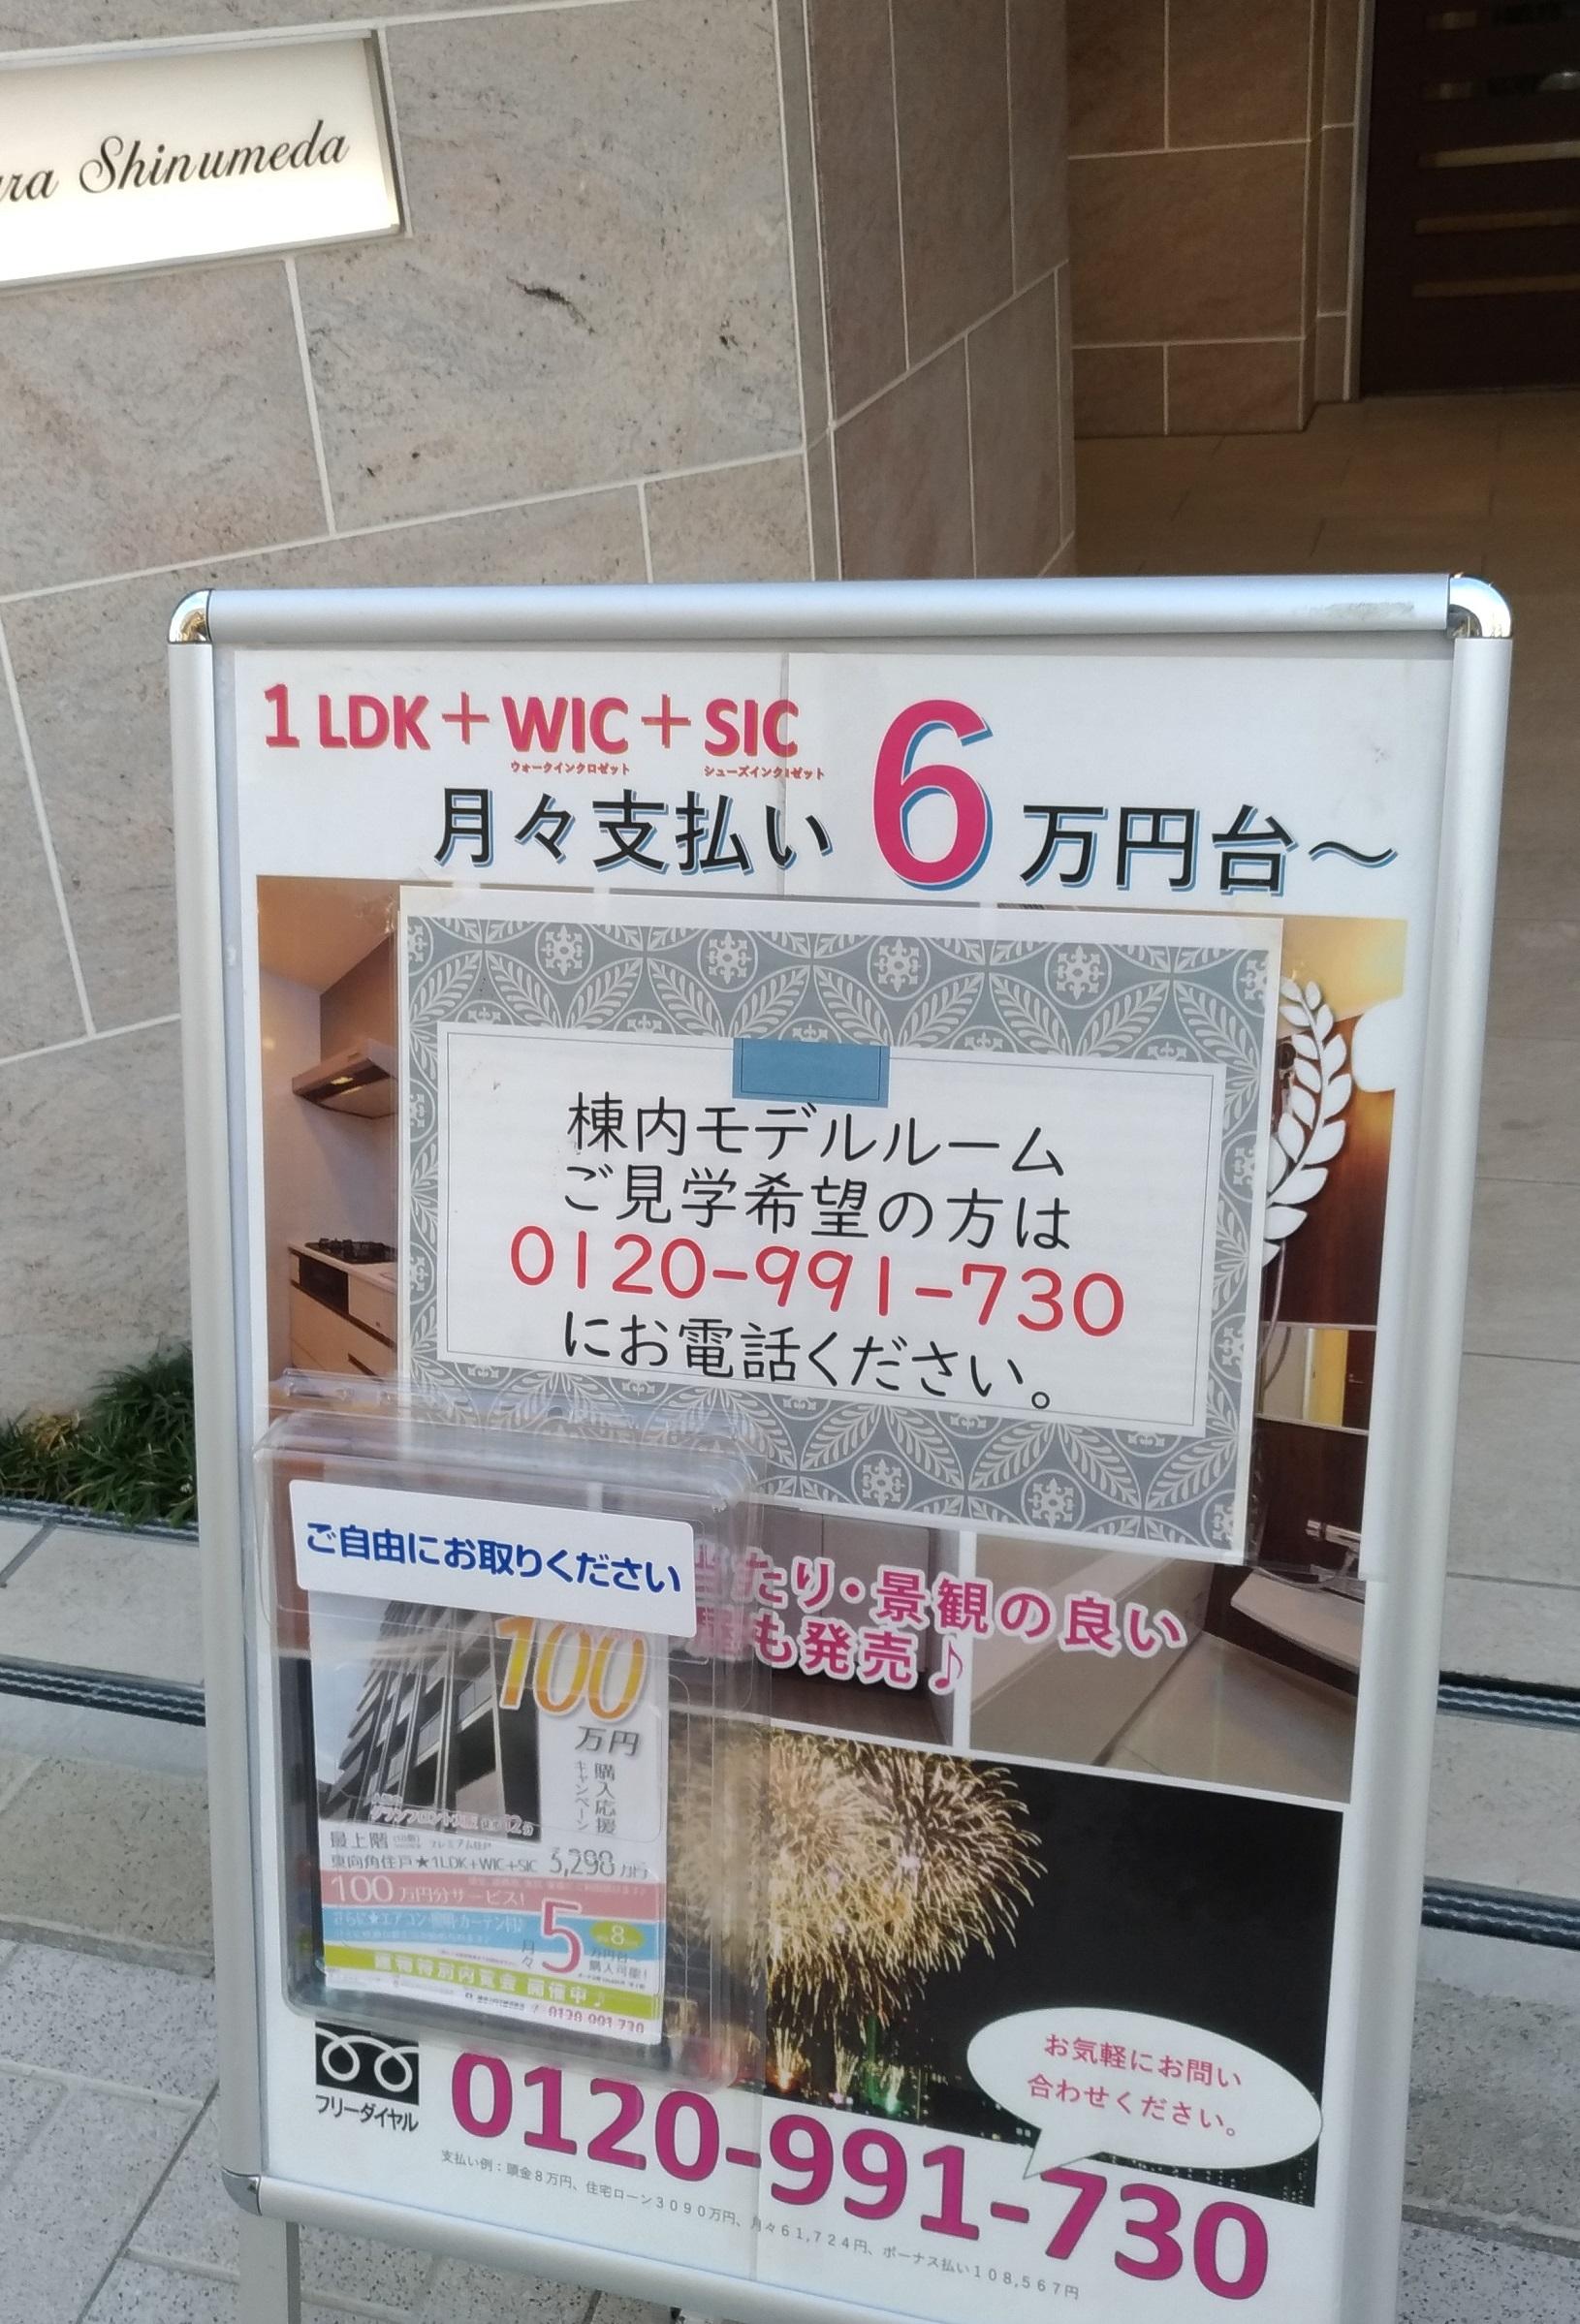 osaka_kitaku_manshon_toshi.jpg